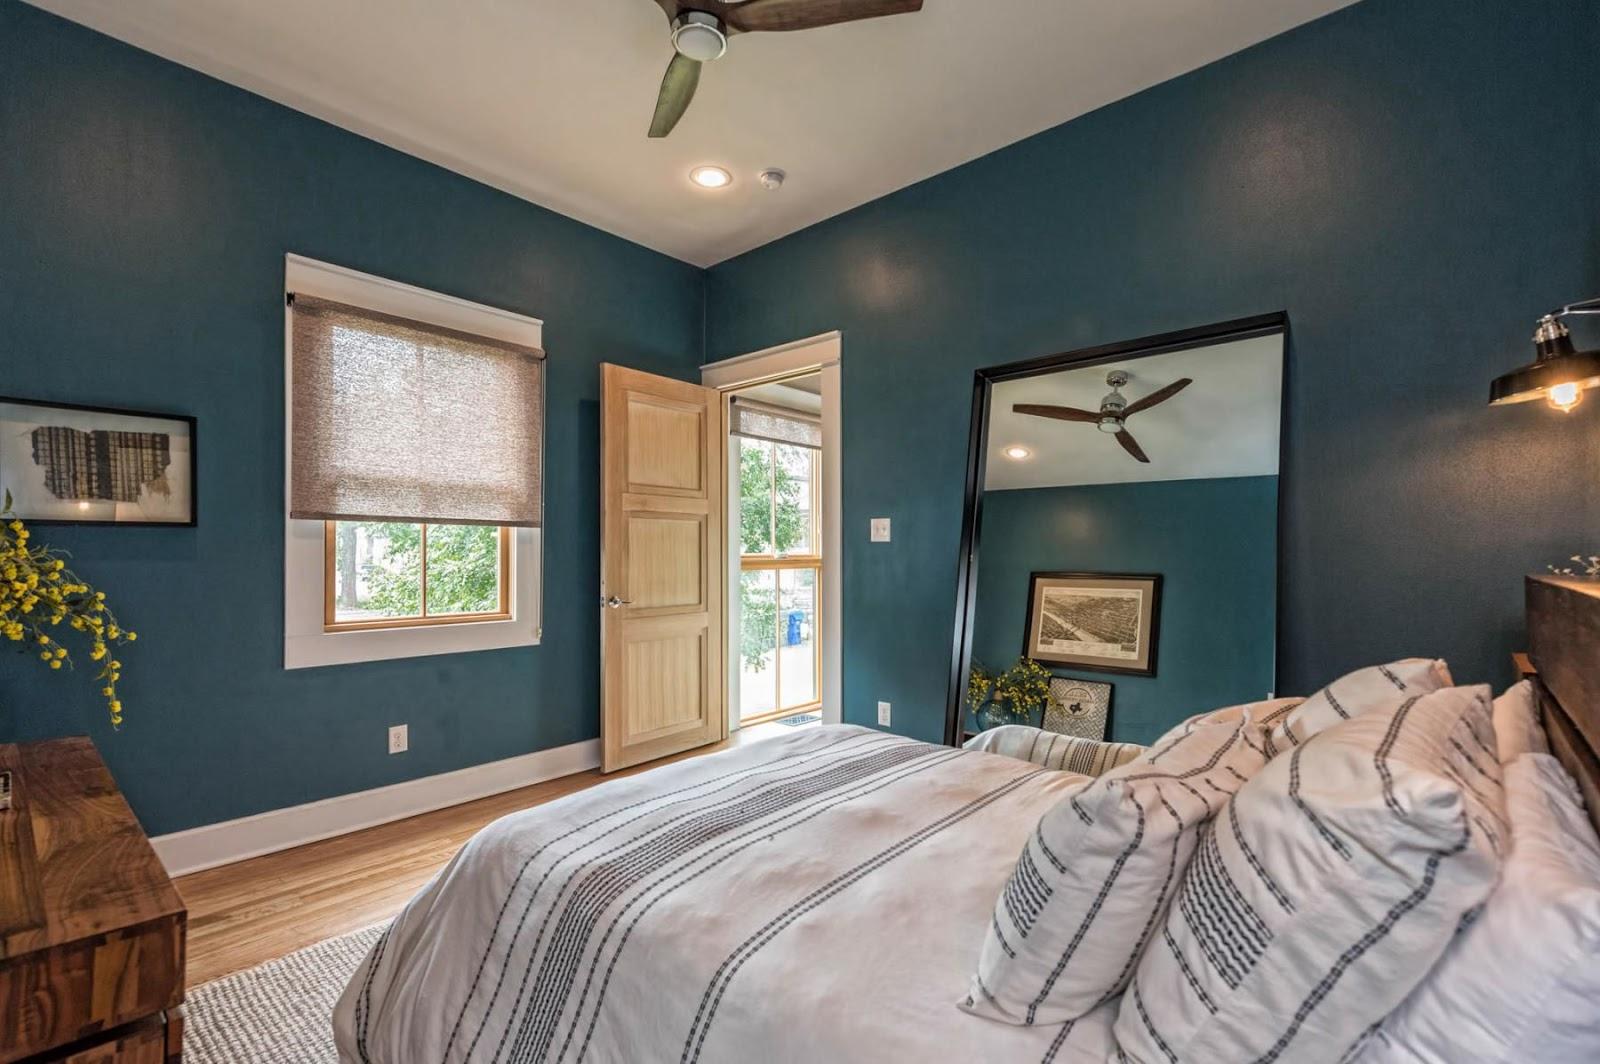 Tiny Home Designs: The Little Living Blog: Fixer Upper's 1 Million Dollar